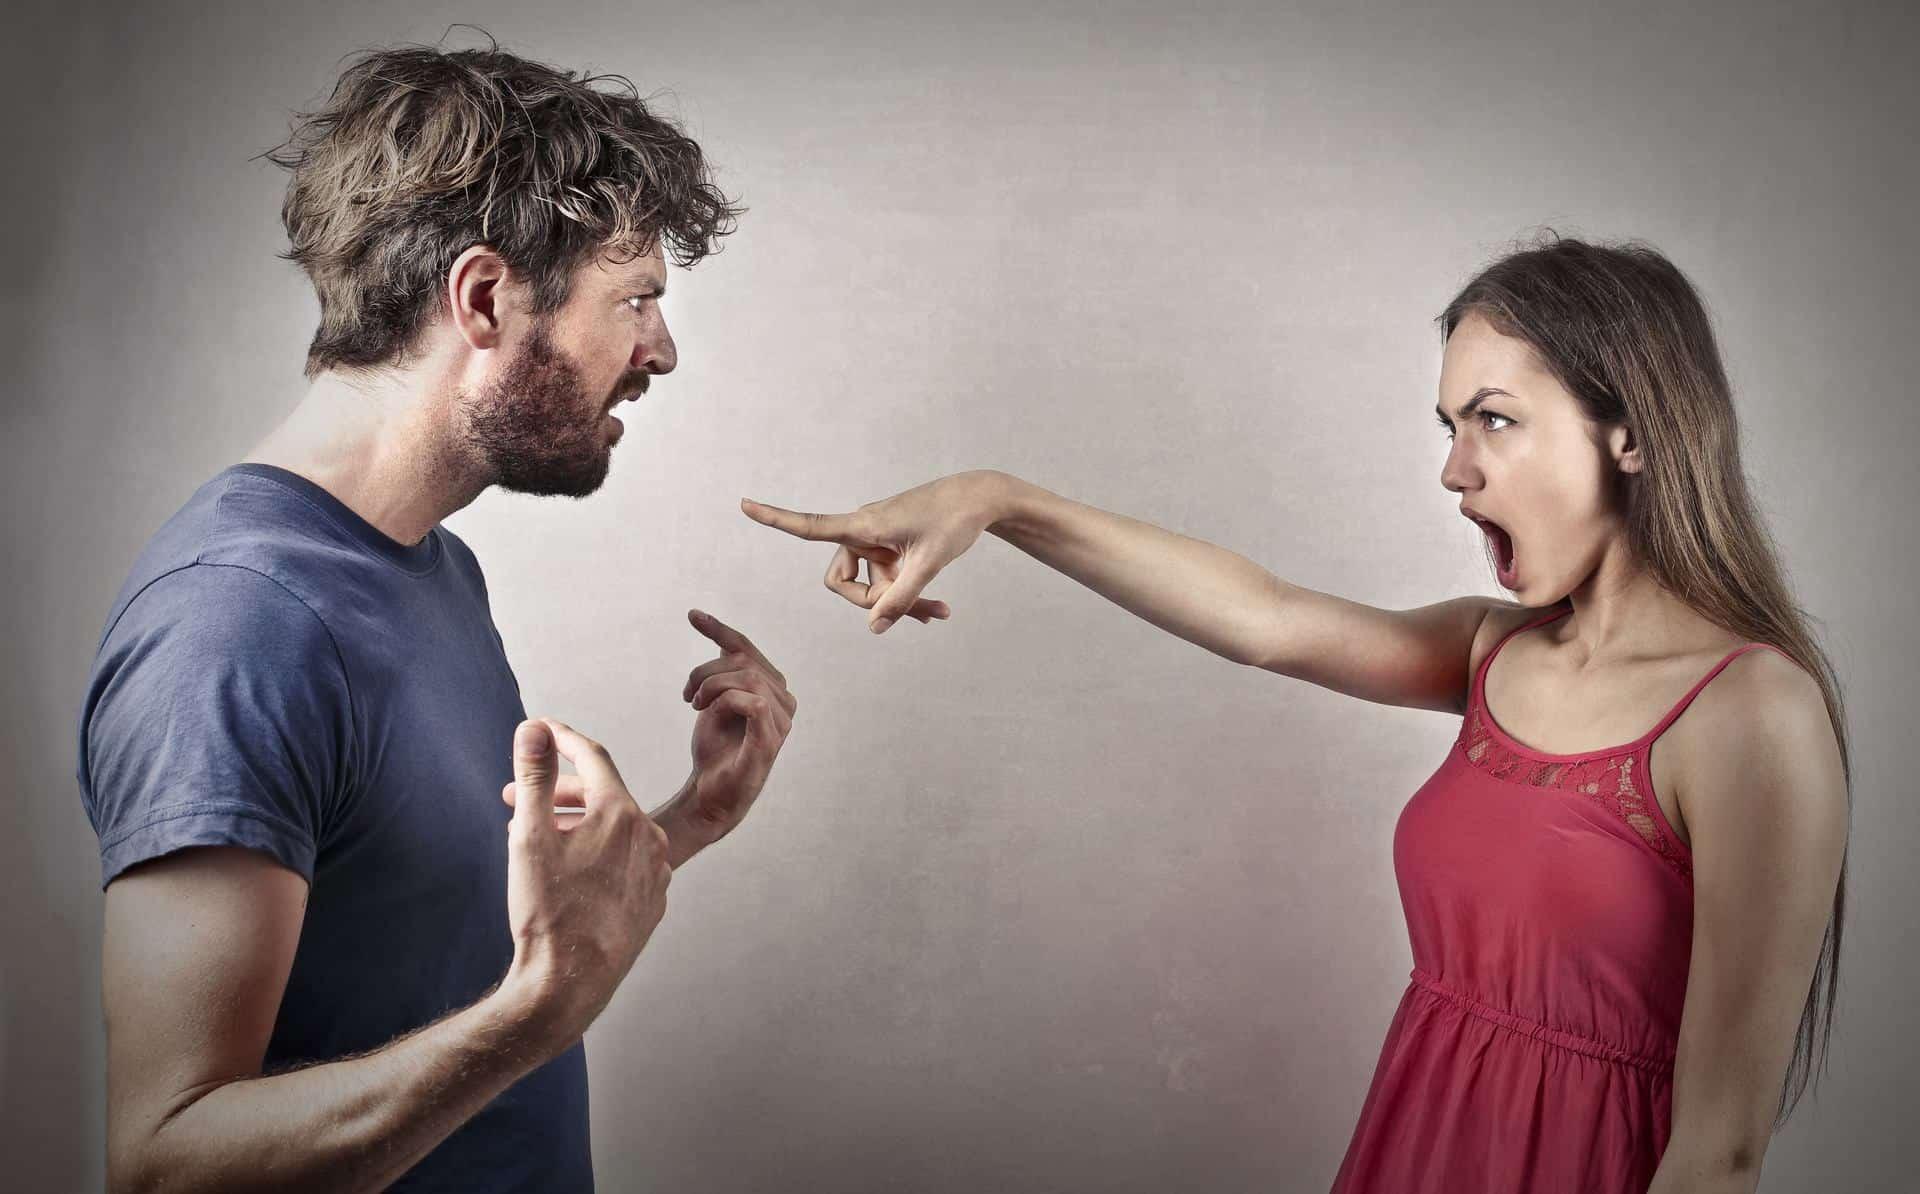 Woman accusing her boyfriend